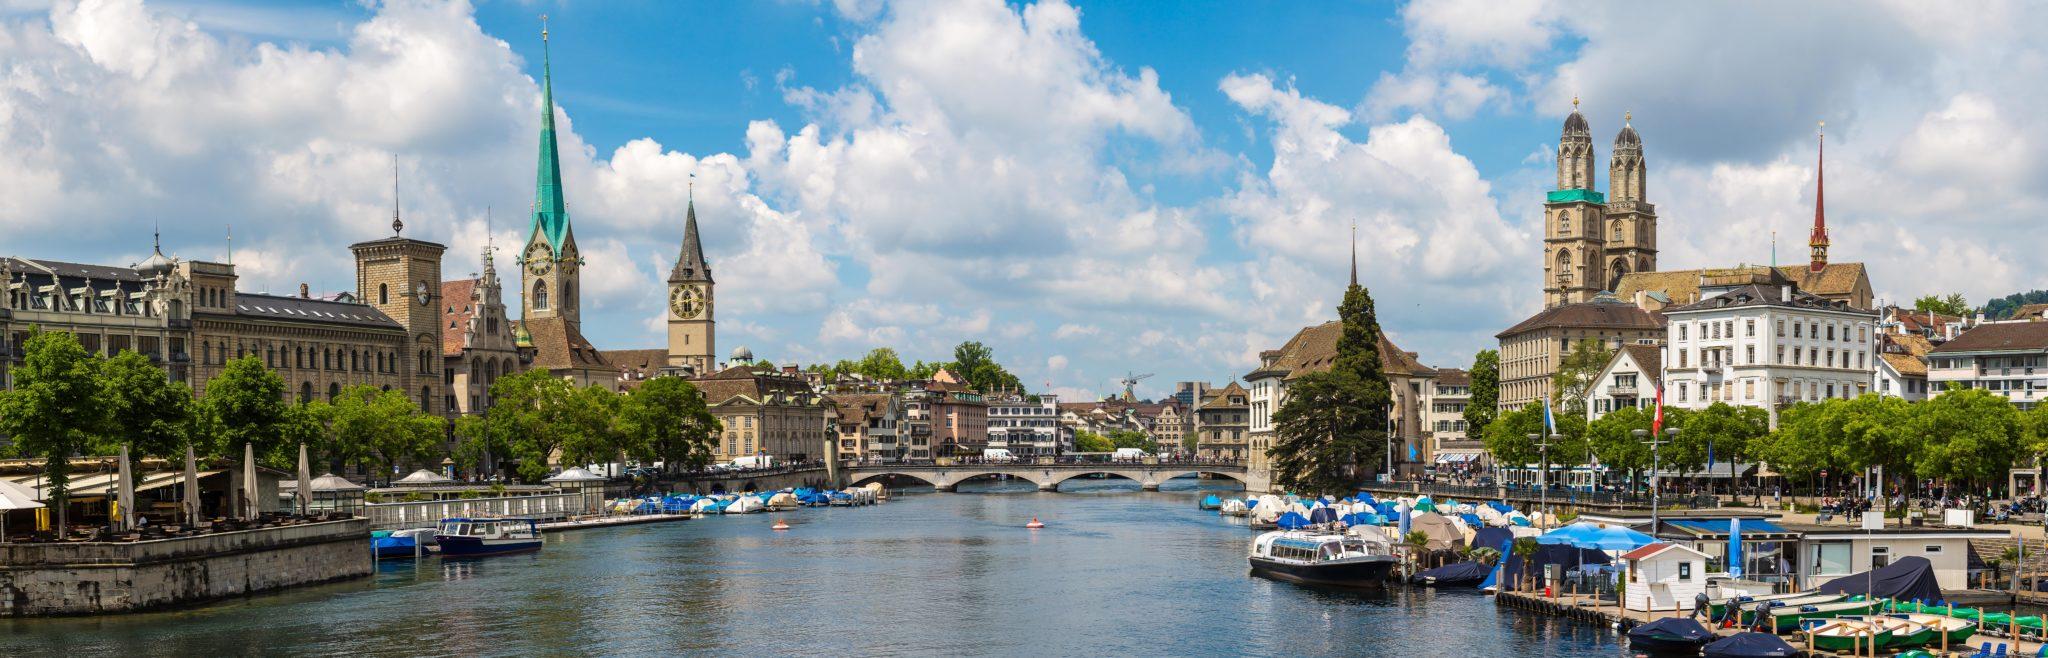 Svizzera, Zurigo